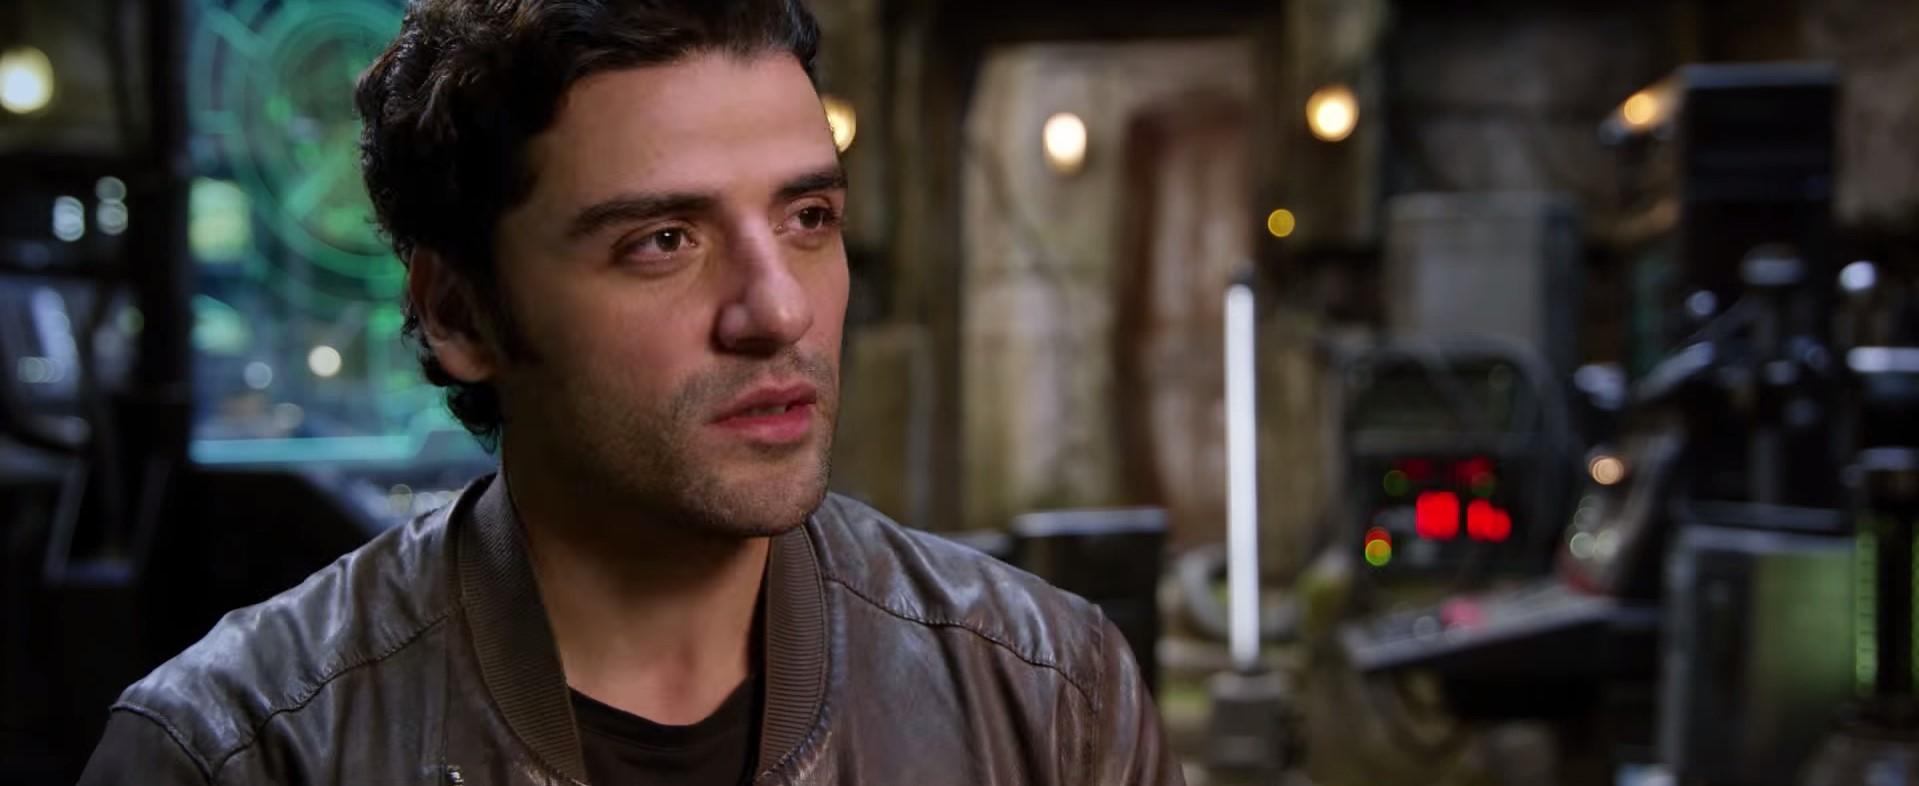 57 Oscar Isaac rocky